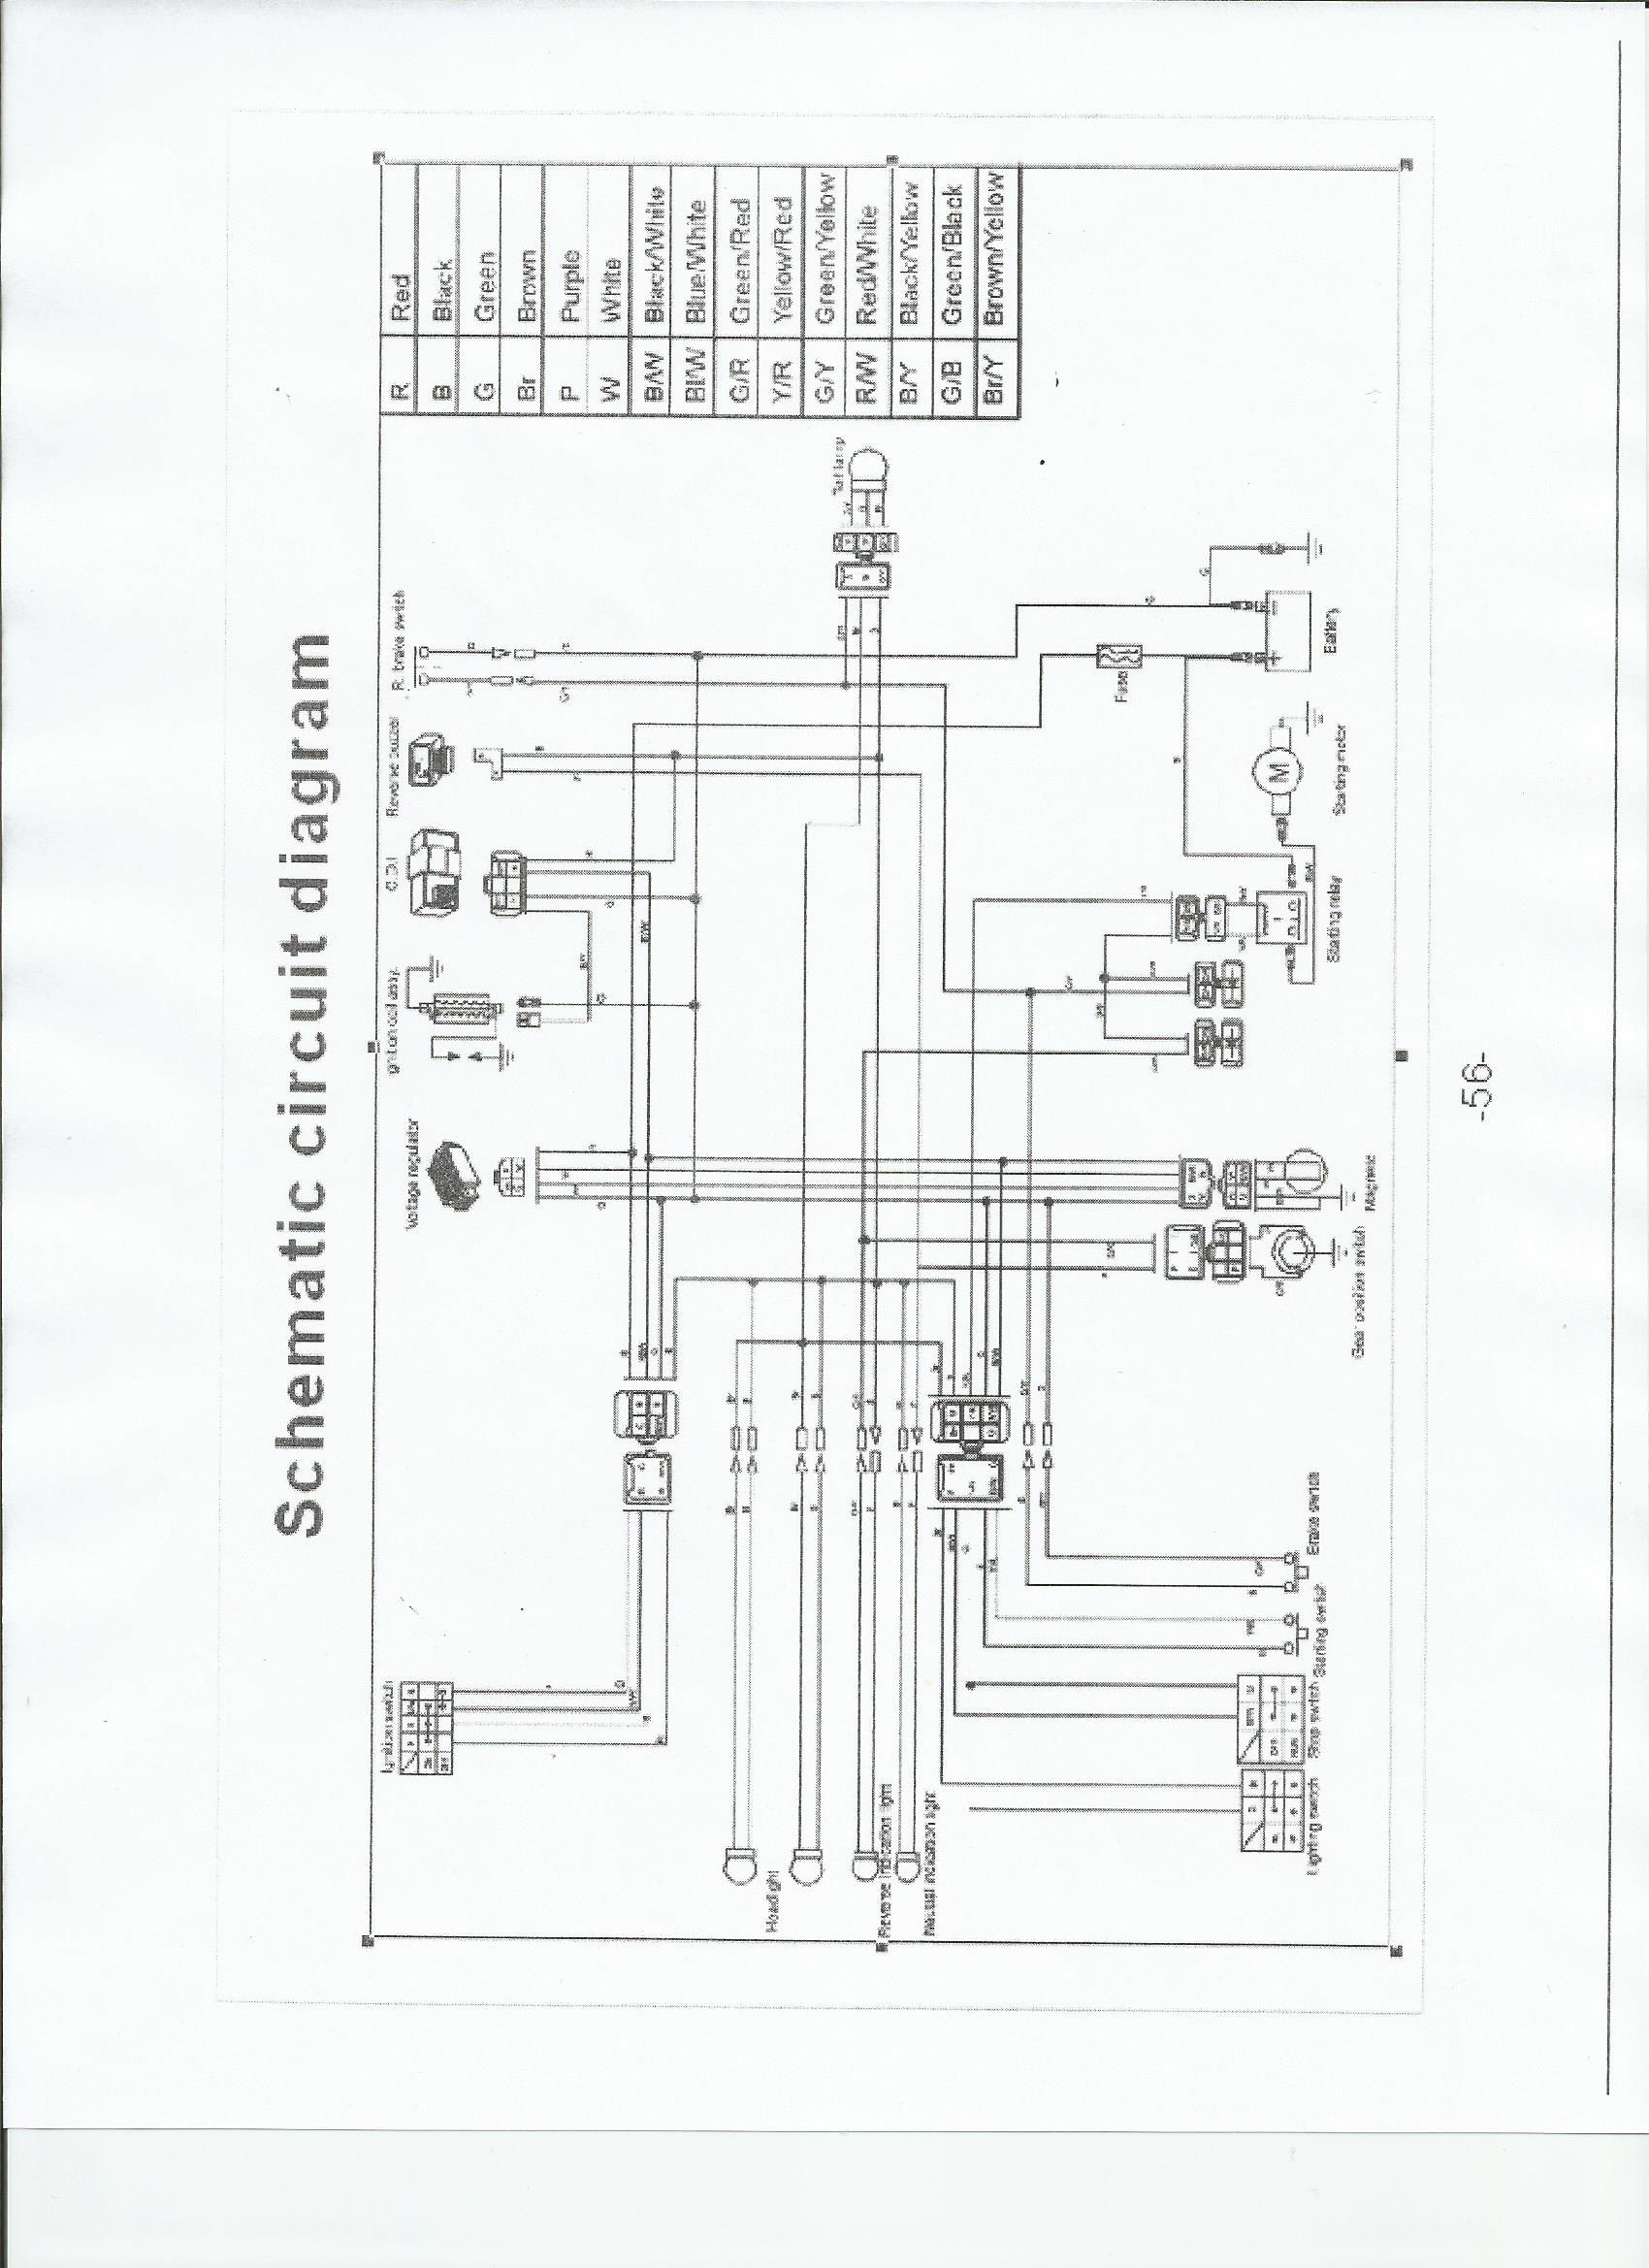 hight resolution of 125cc starter diagram wiring diagram z4125cc starter diagram online wiring diagram ford starter solenoid wiring diagram